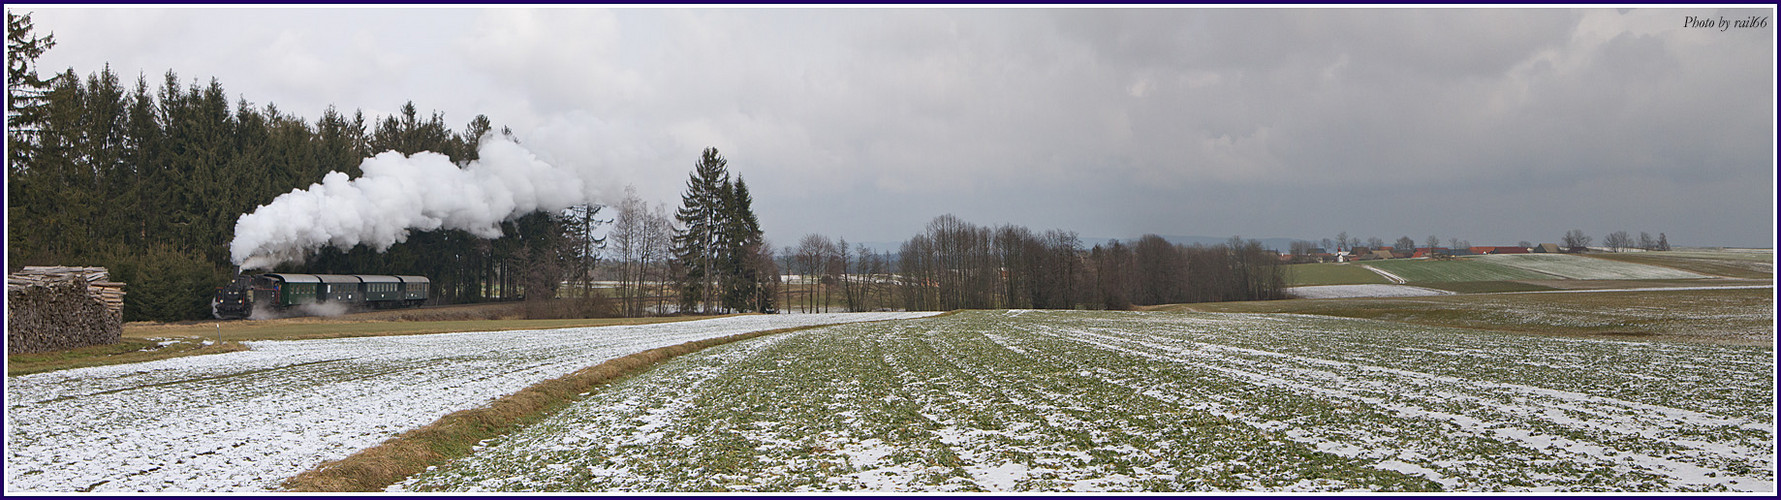 Waldviertelpanorama II